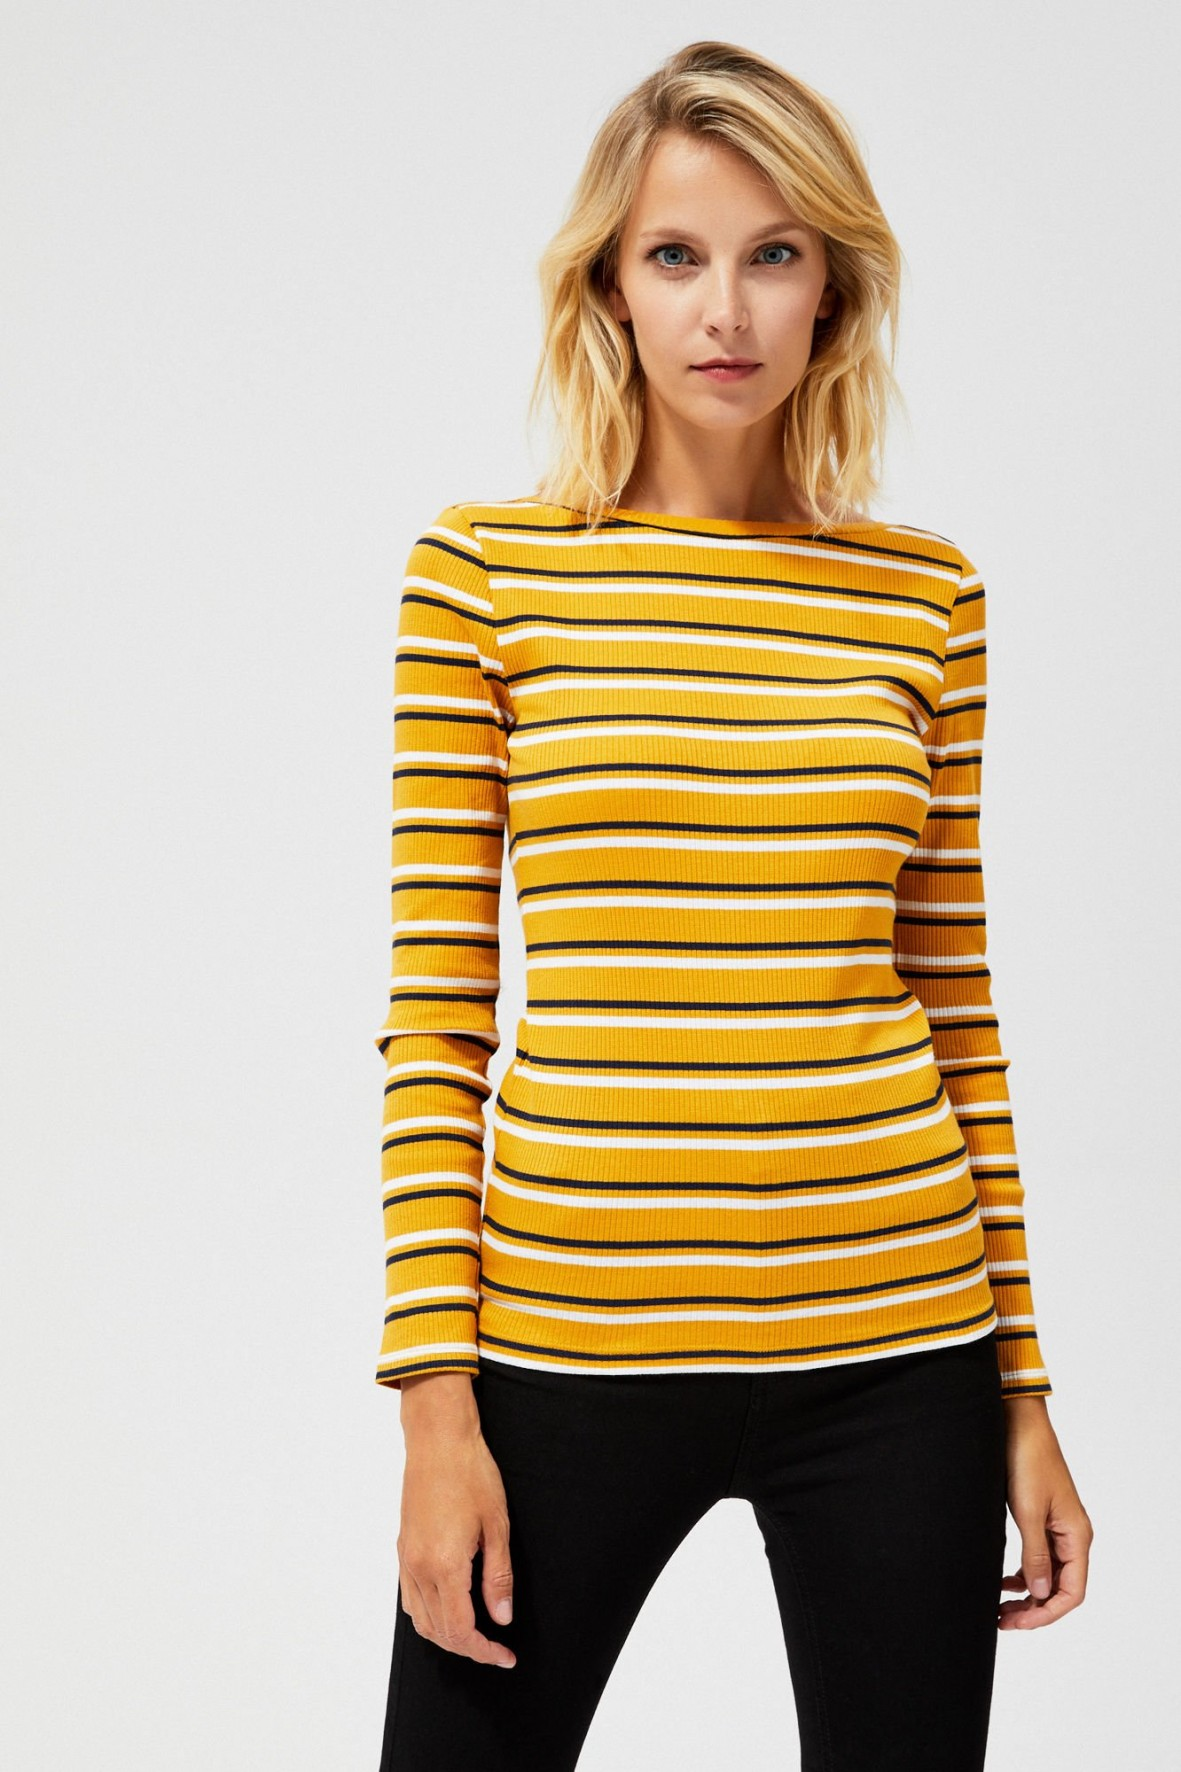 Bluzka ribbowa w paski - żółta